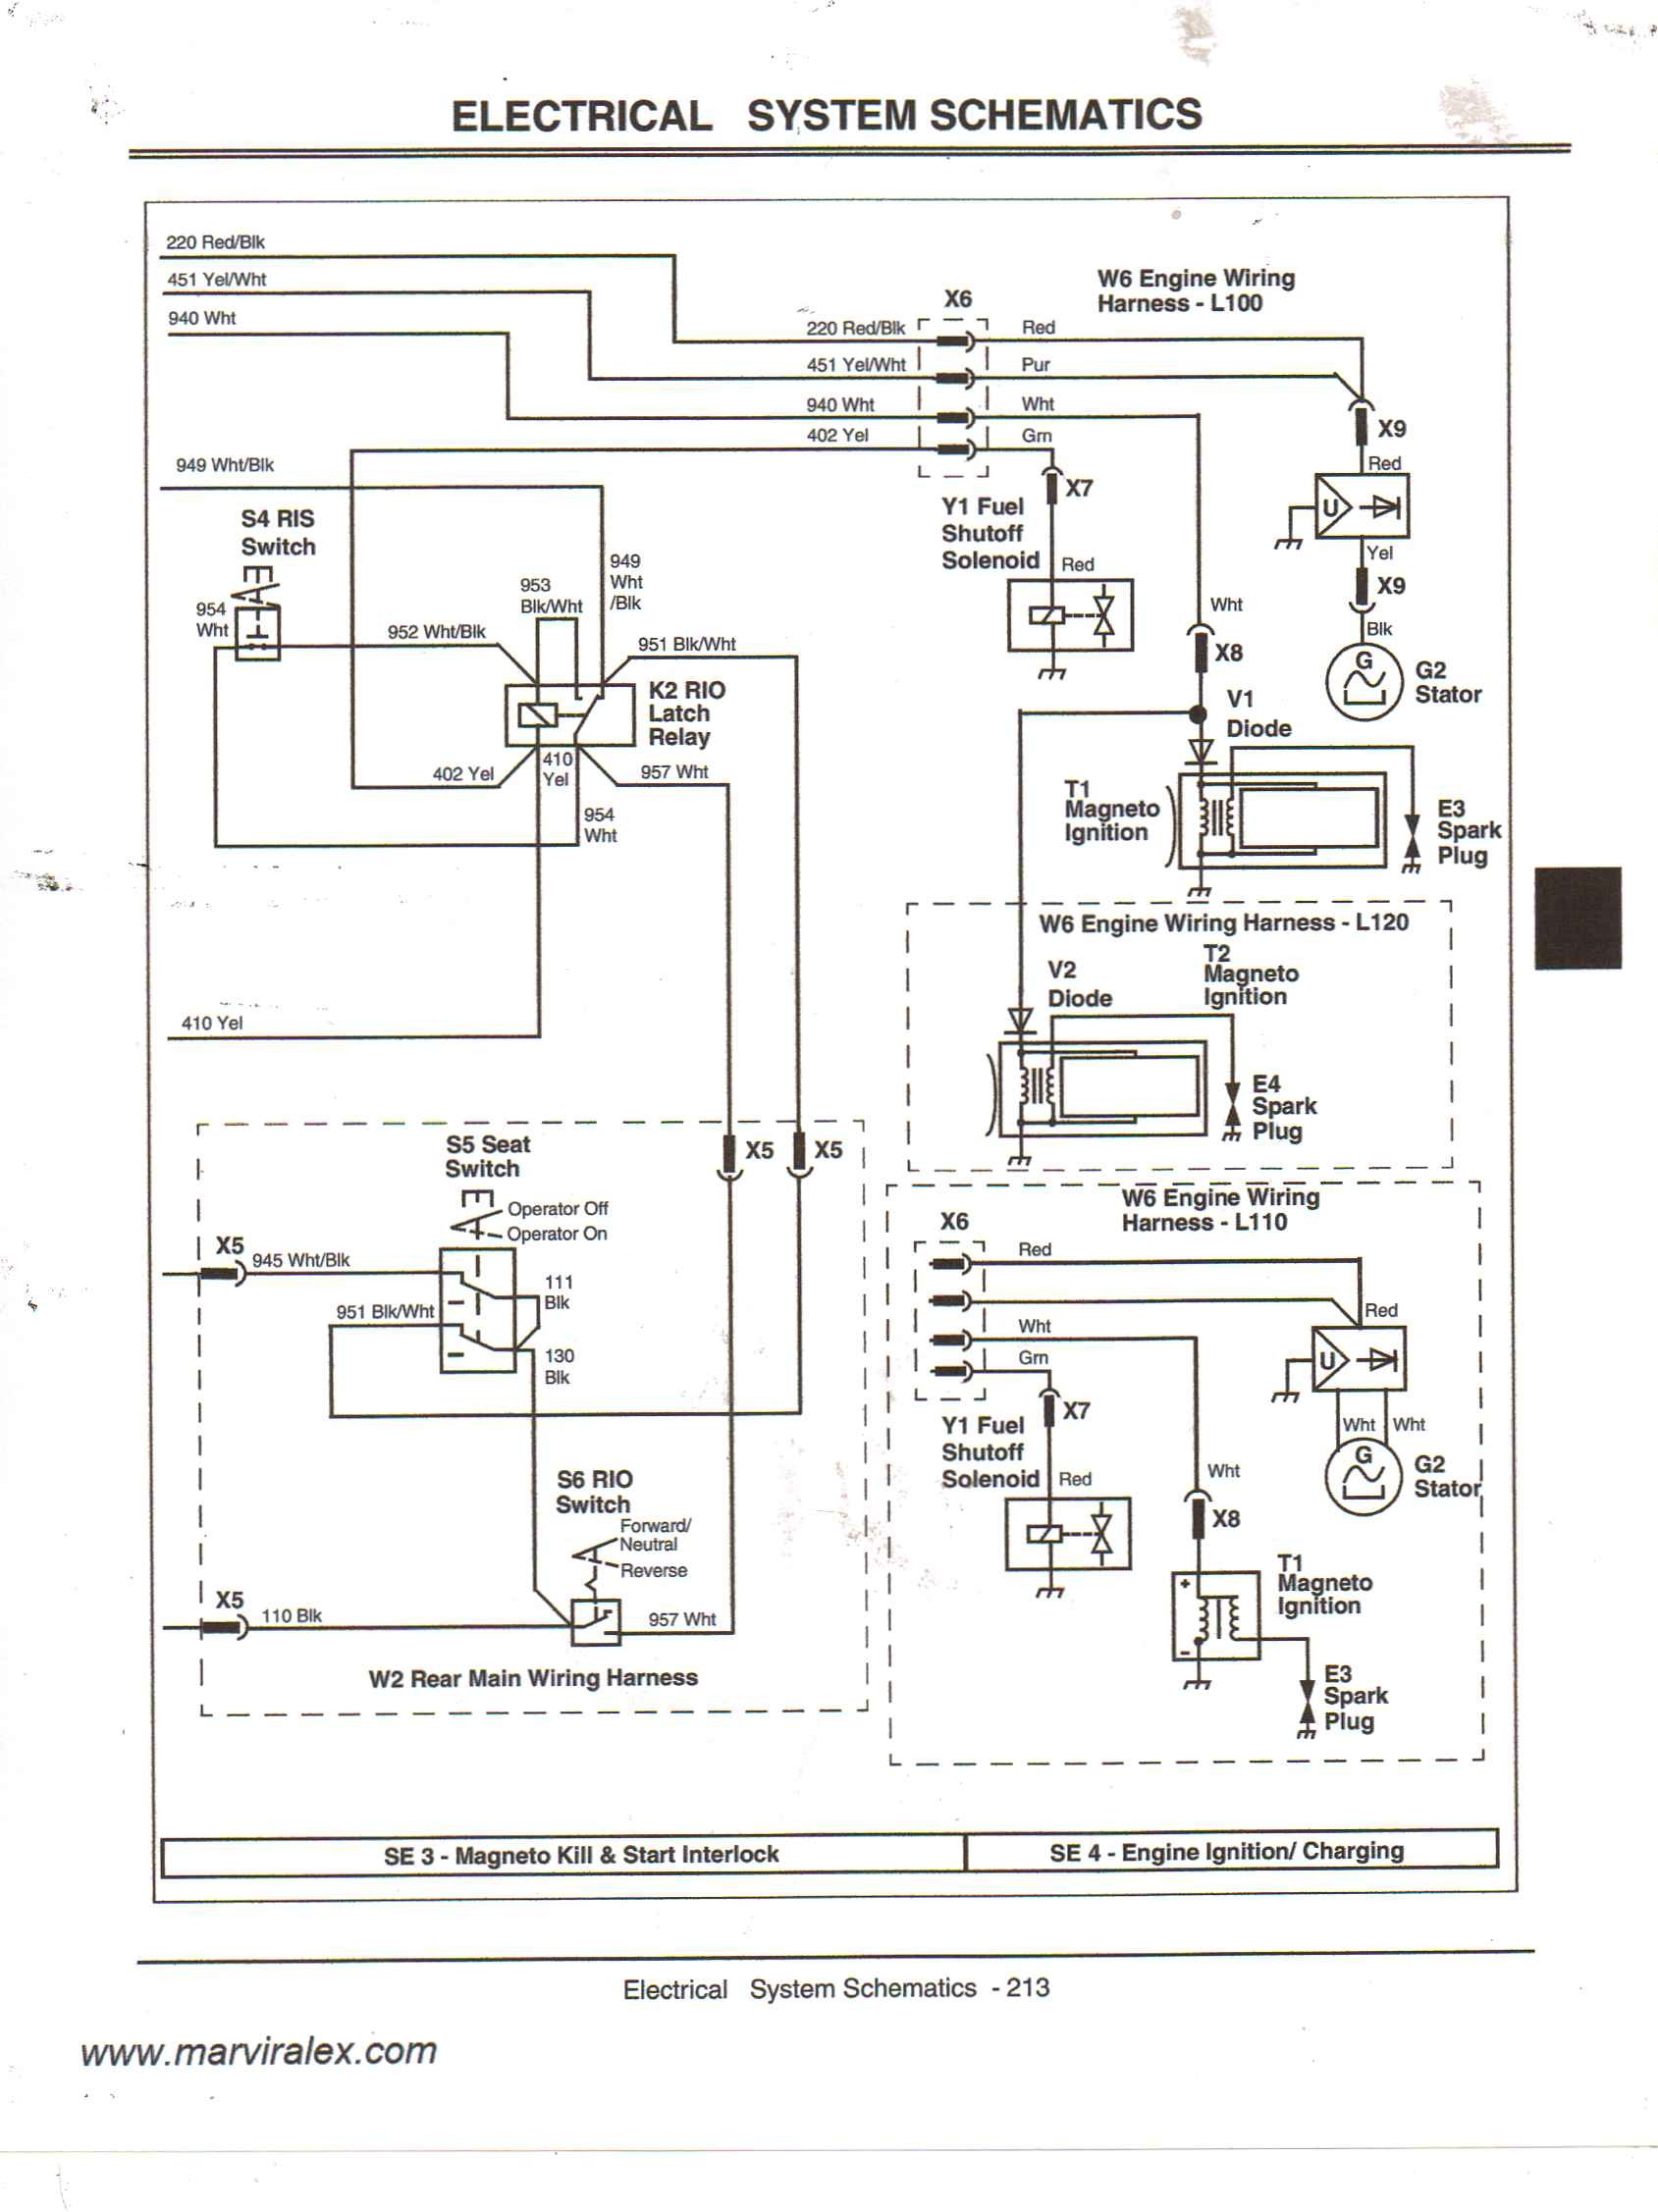 John Deere Gator Ignition Diagram Ww 1570] for John Deere 1050 Tractor Wiring Diagram Free Diagram Of John Deere Gator Ignition Diagram